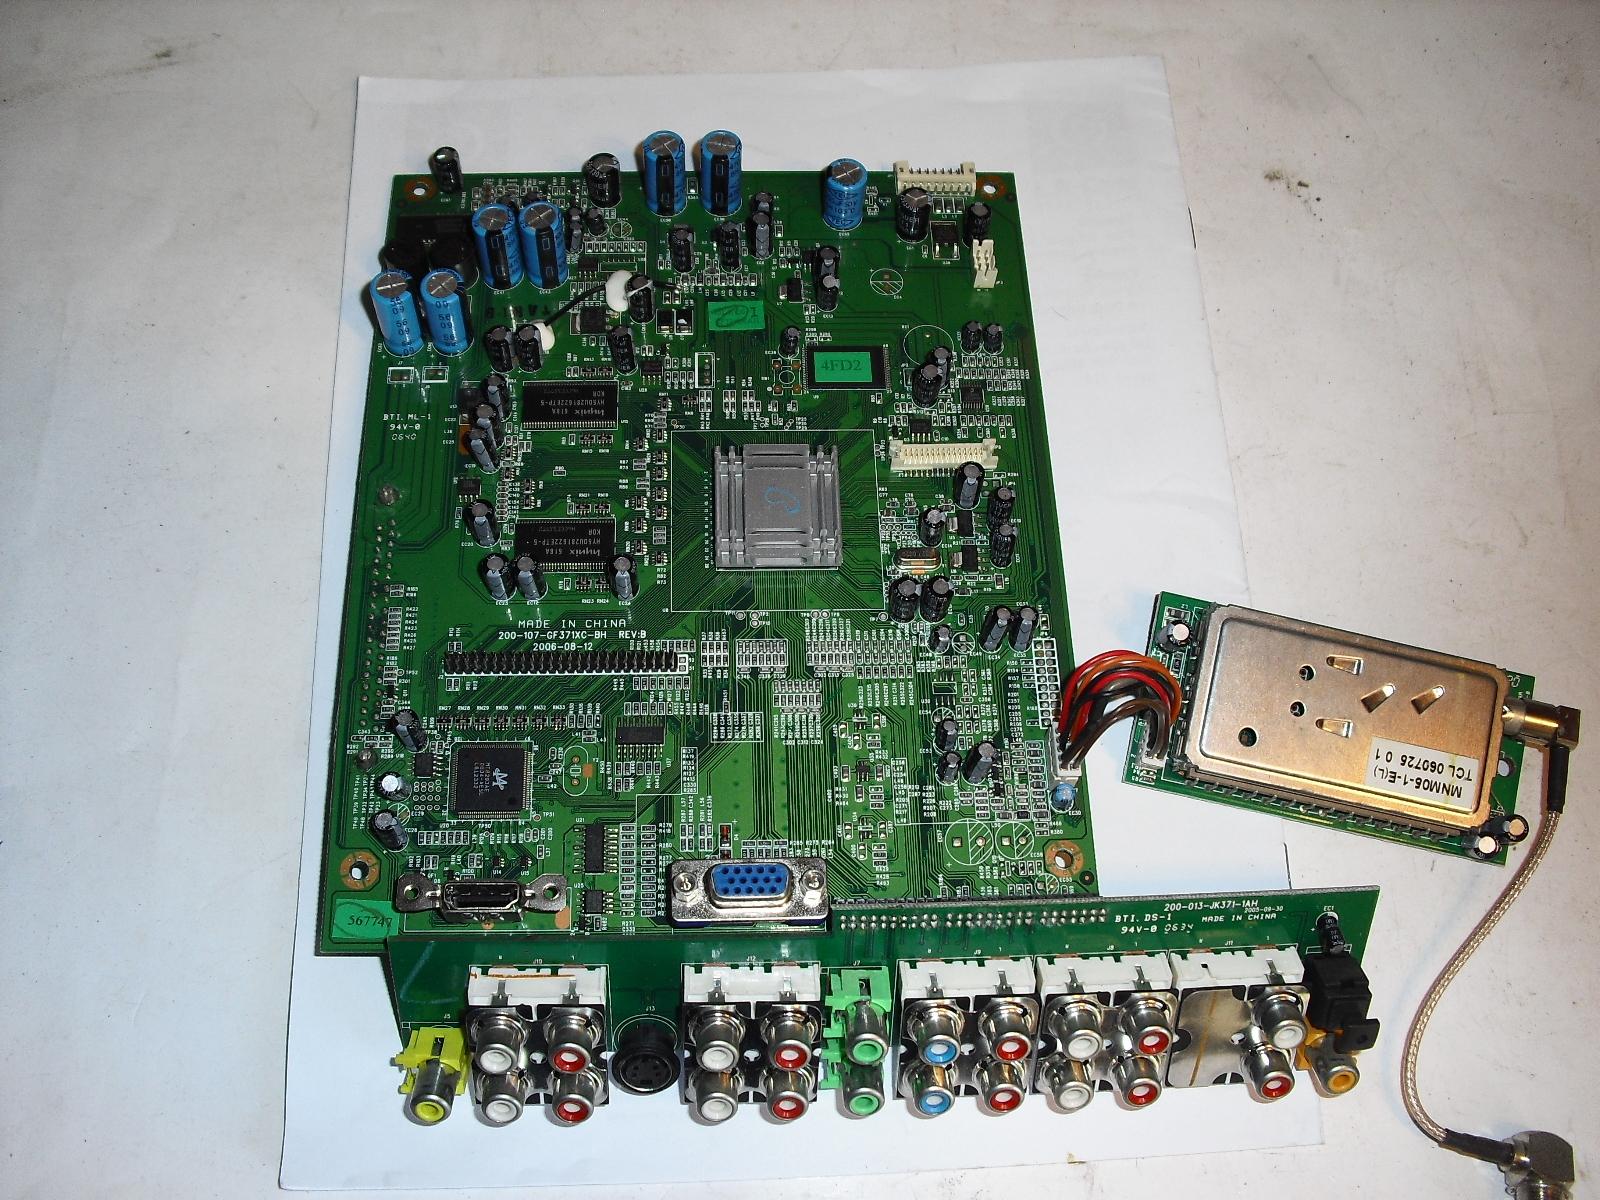 899-kq0-ef3210xah rev  .01  main  board  for  mag  polaroid  flm323  - $34.99